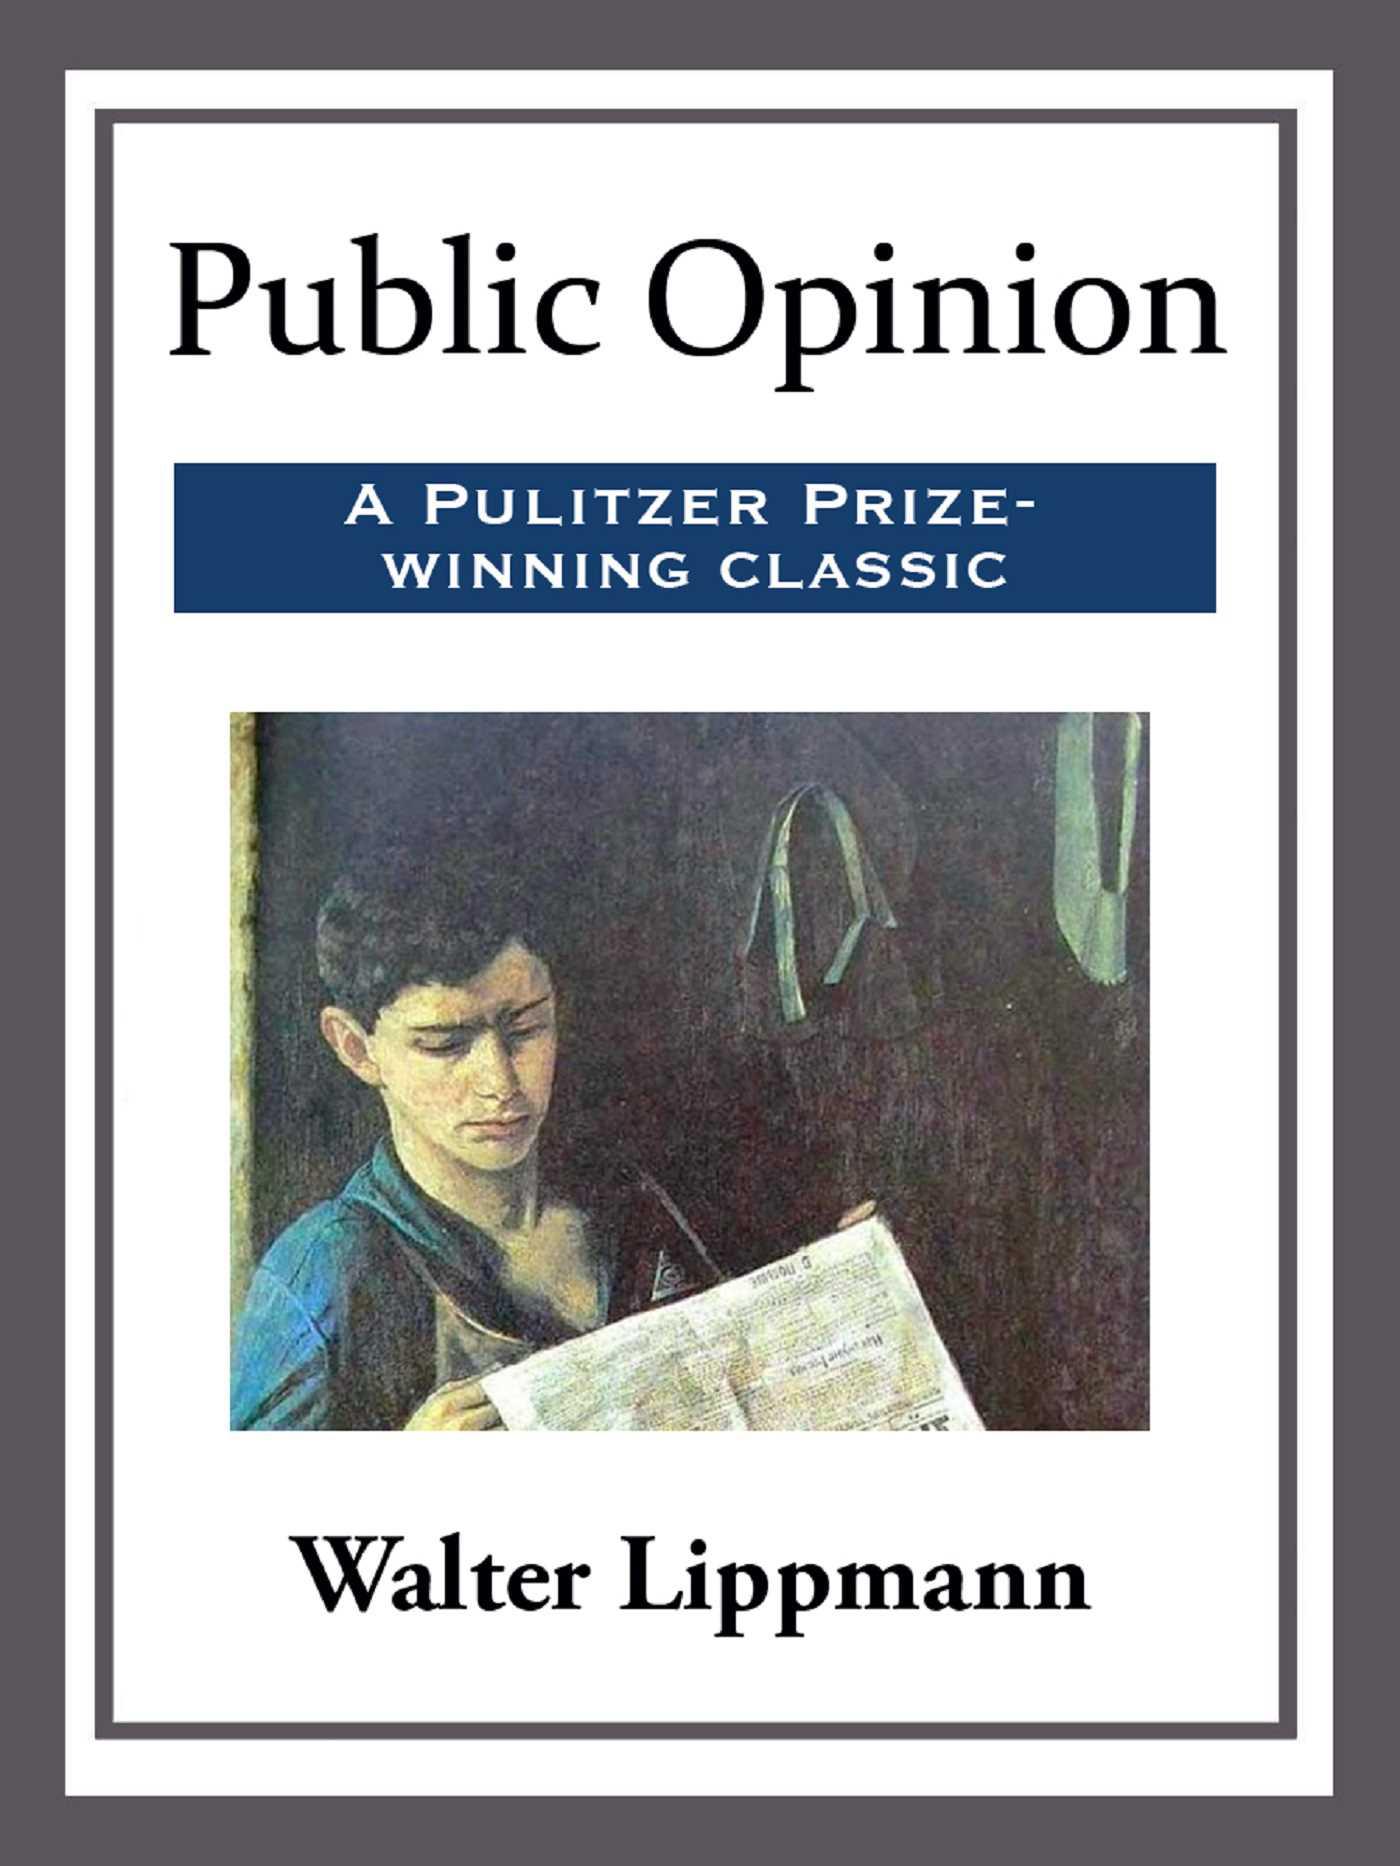 Public opinion 9781681464114 hr